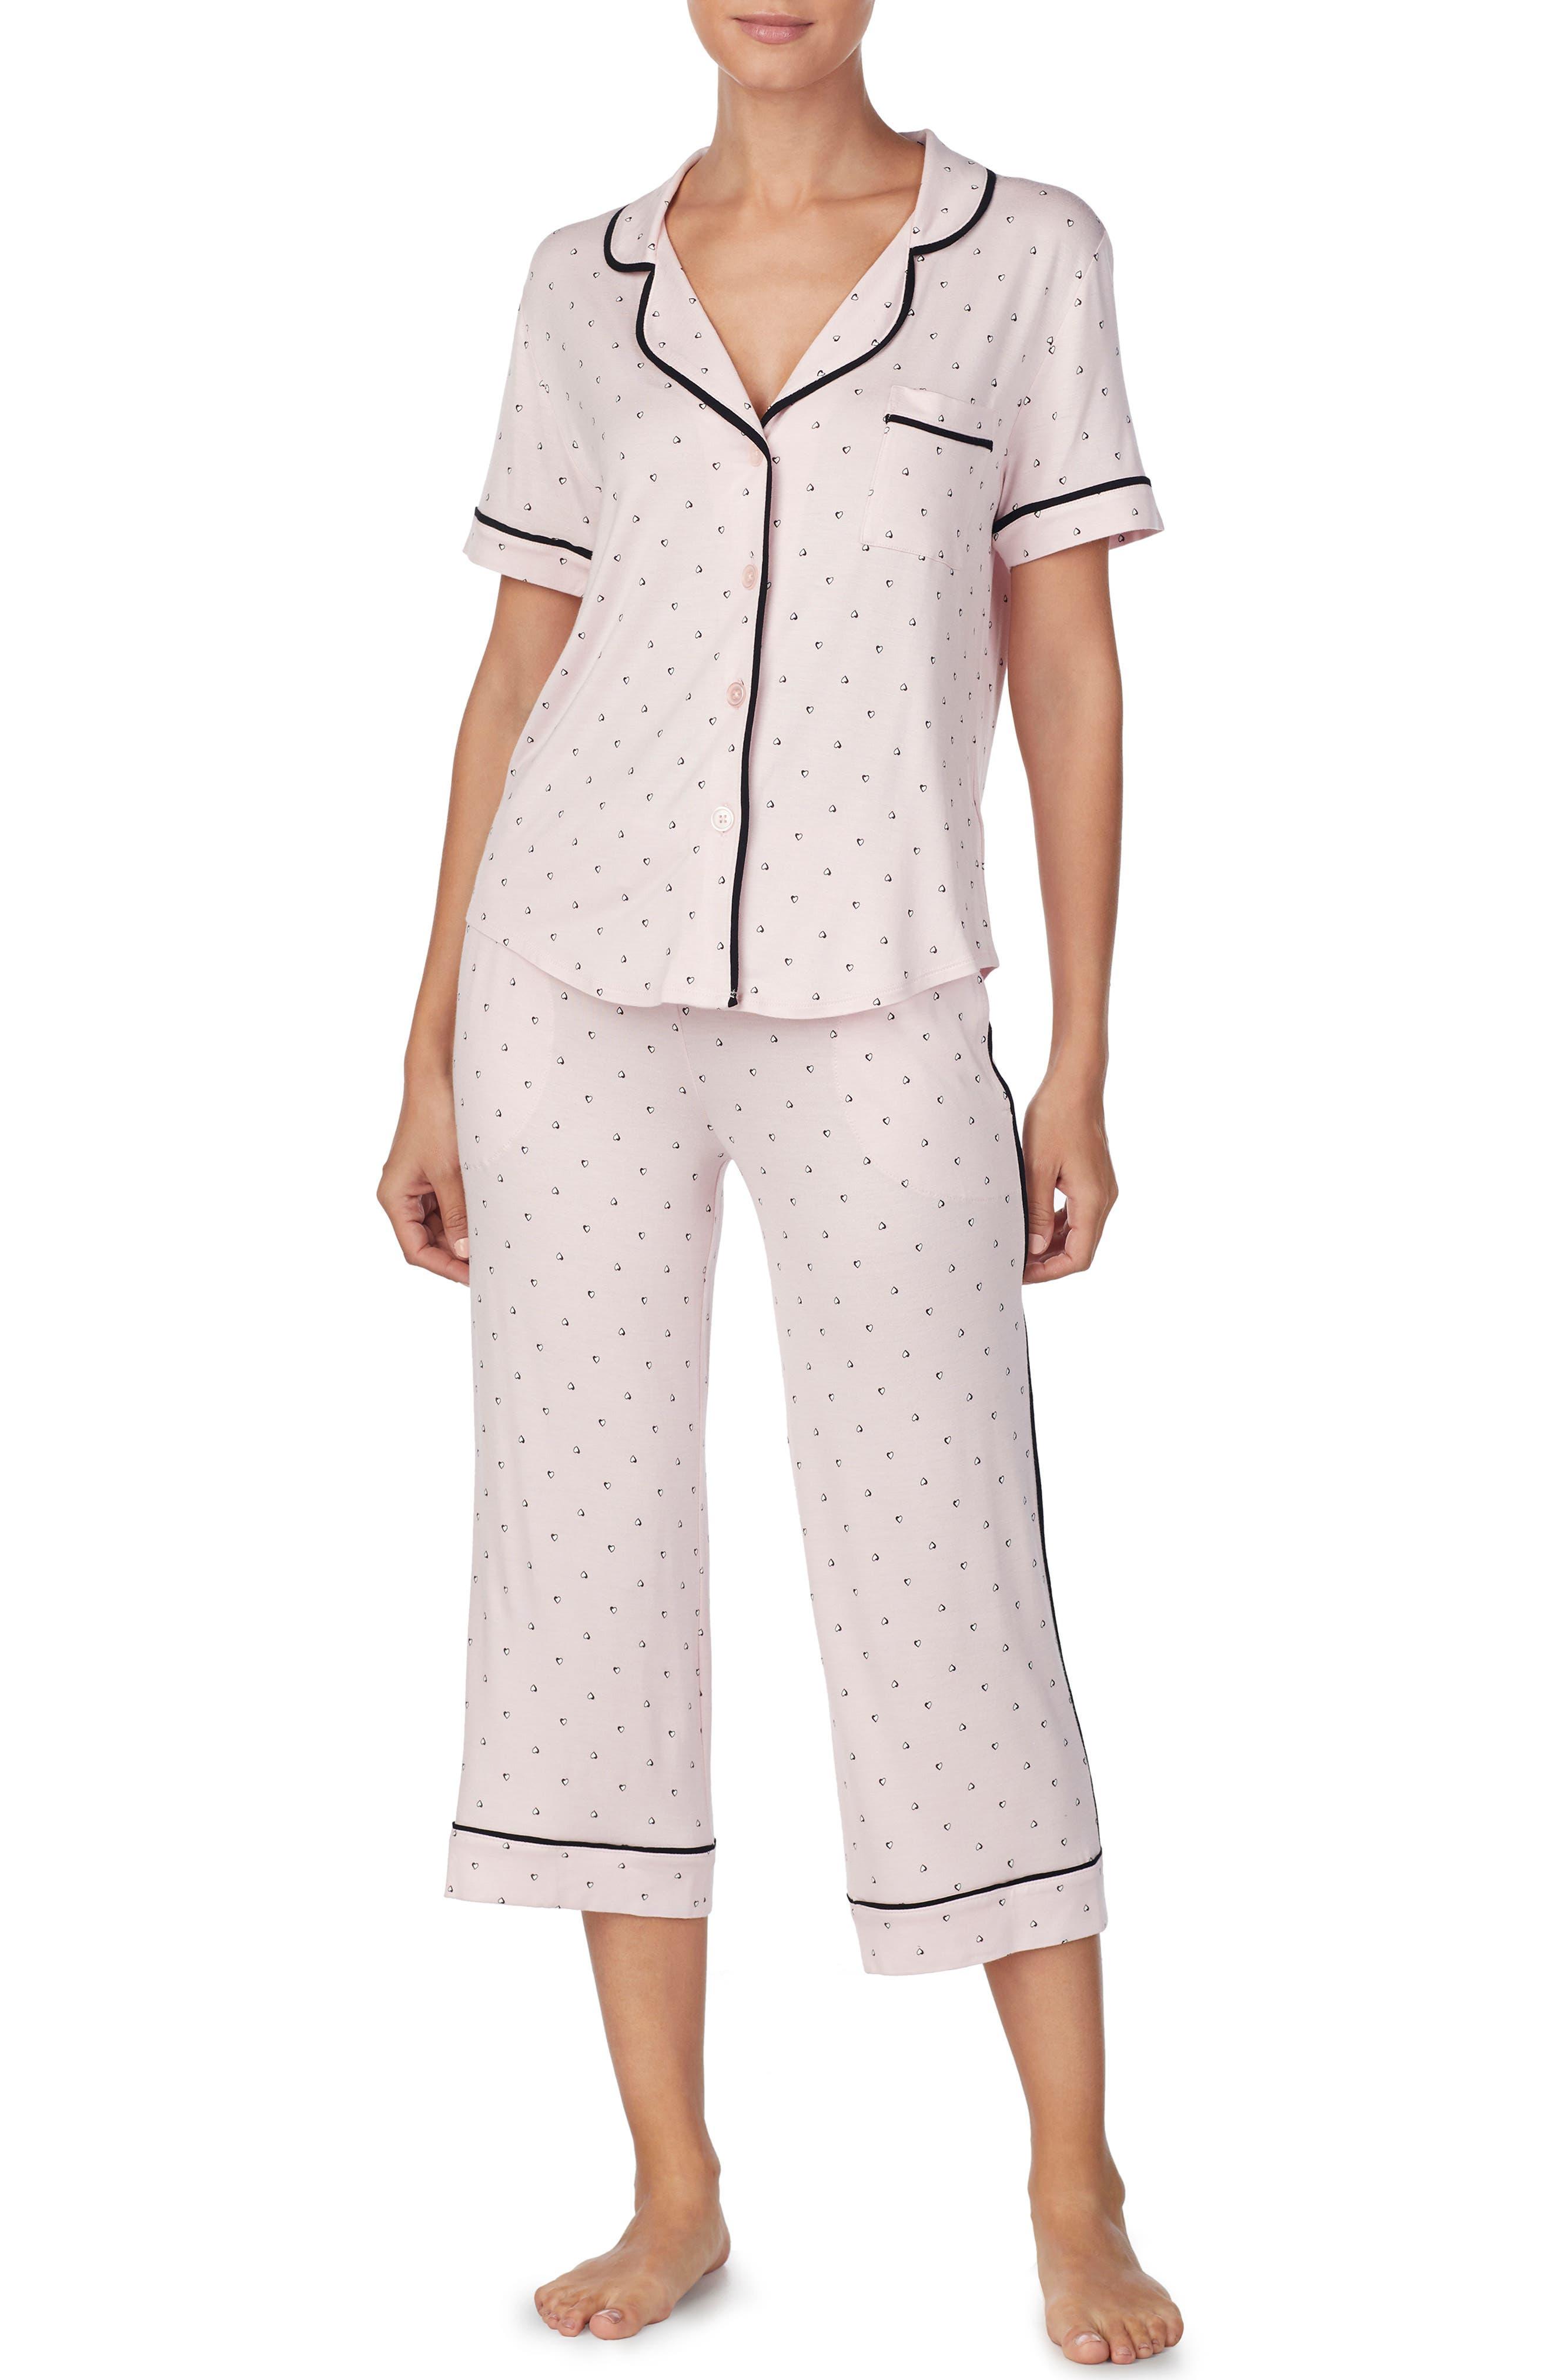 ROOM SERVICE Crop Pajamas, Main, color, PINK SHADED HEARTS